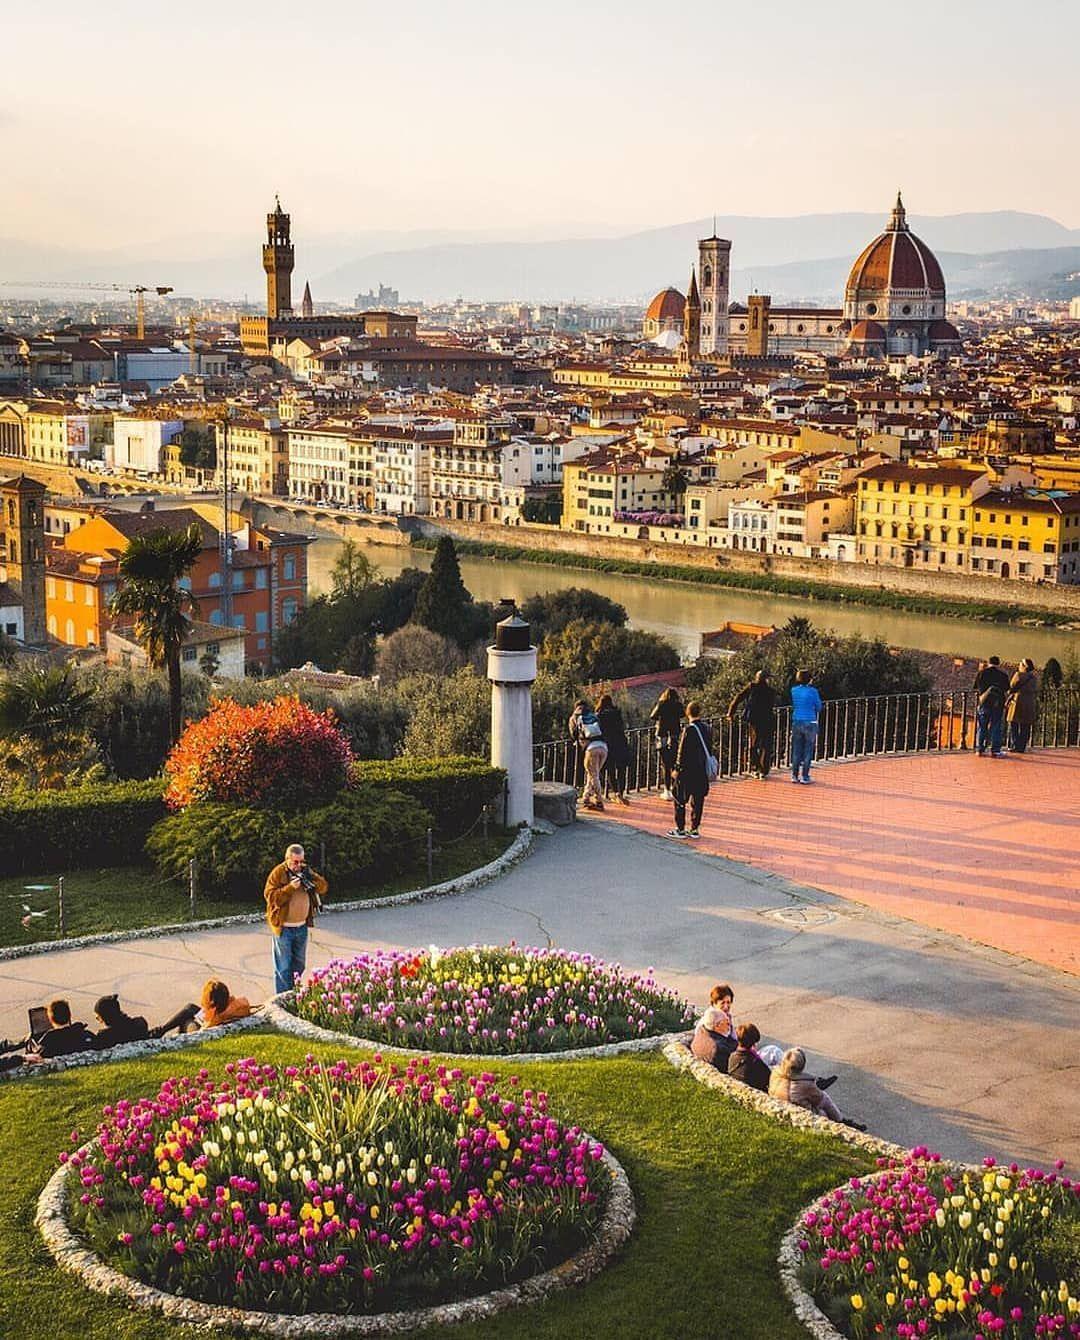 firenca-toskana-italija-dante-da_vinci-romantika-putovanja-travel